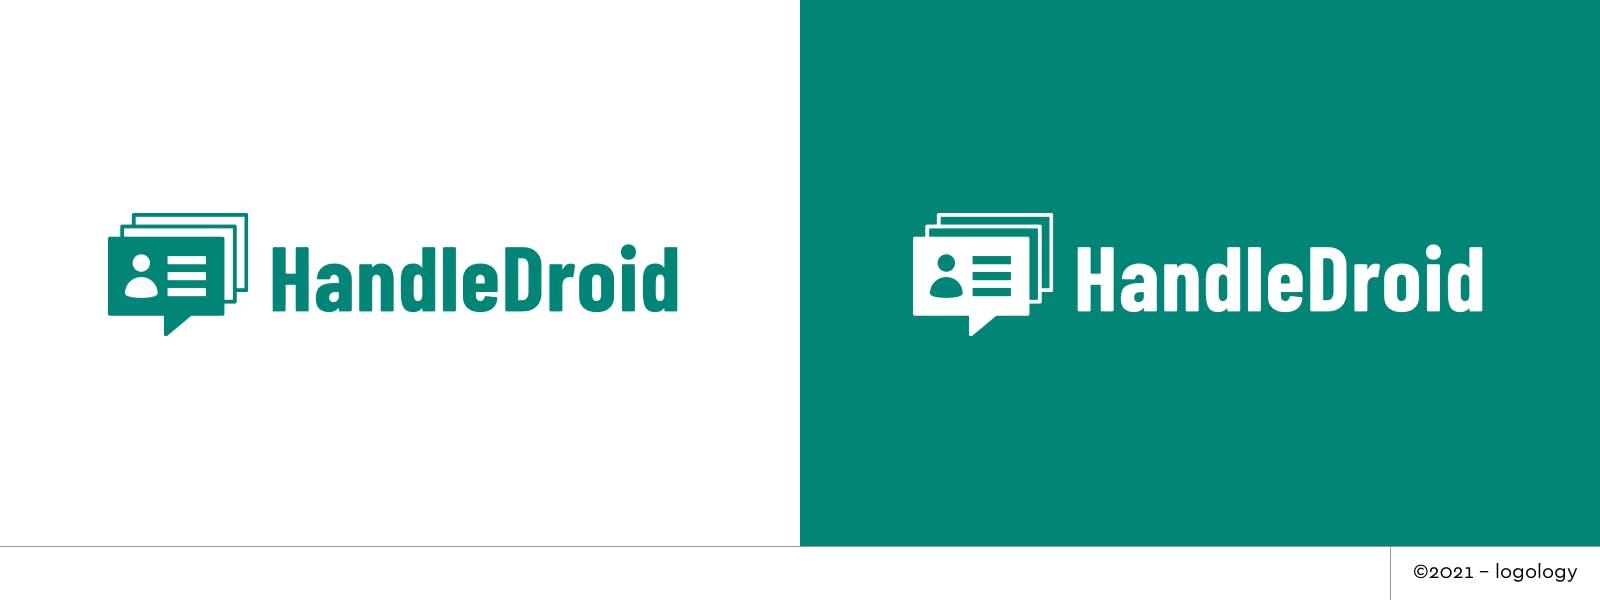 handledroid user identity and bot tracking logo variation